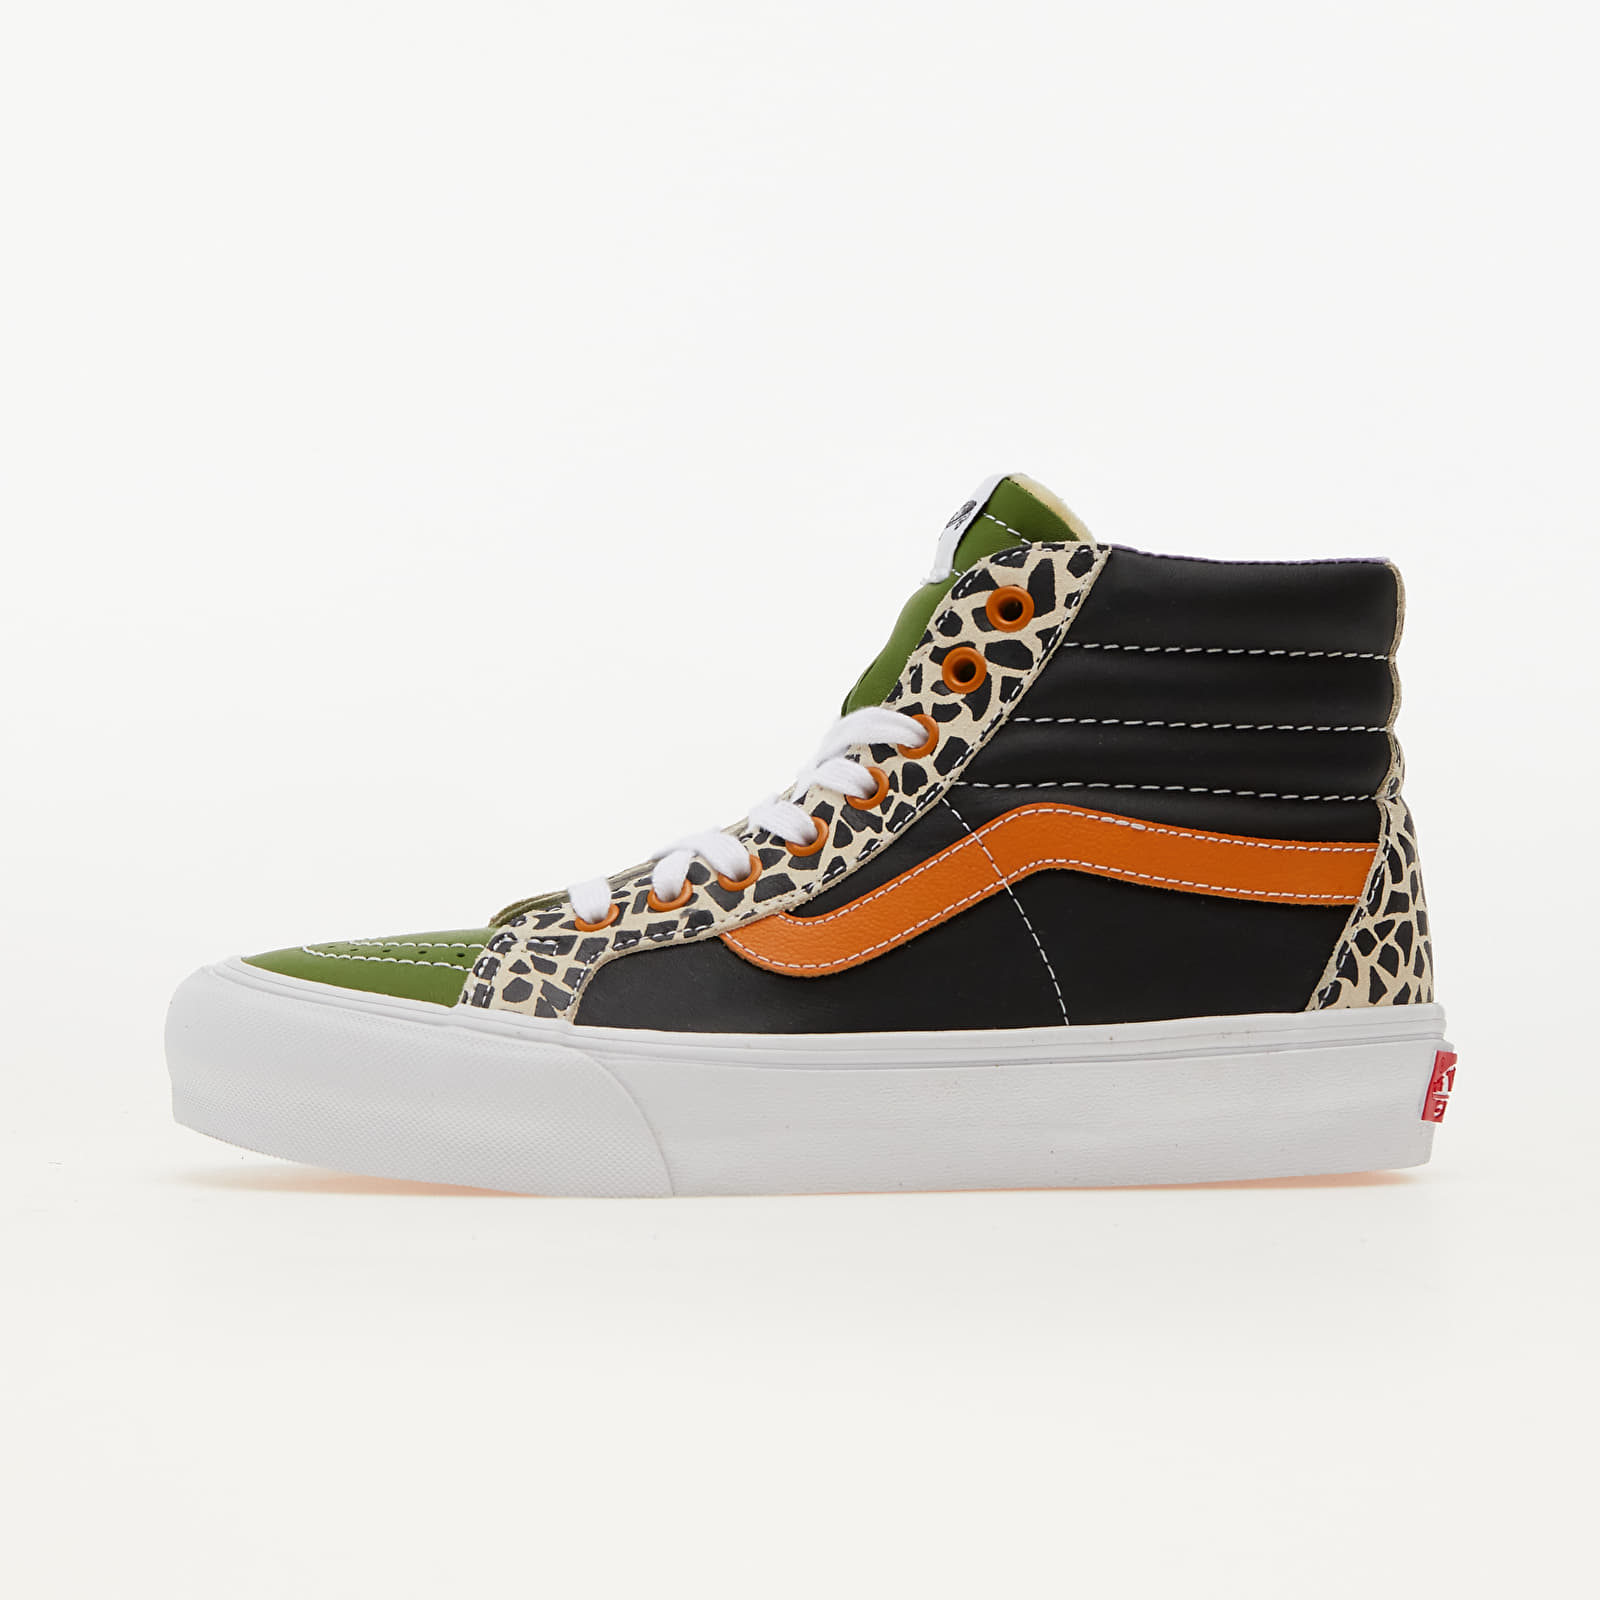 Vans Sk8-Hi Reissue EF (Leather/ Suede) Cactus/ Black EUR 43